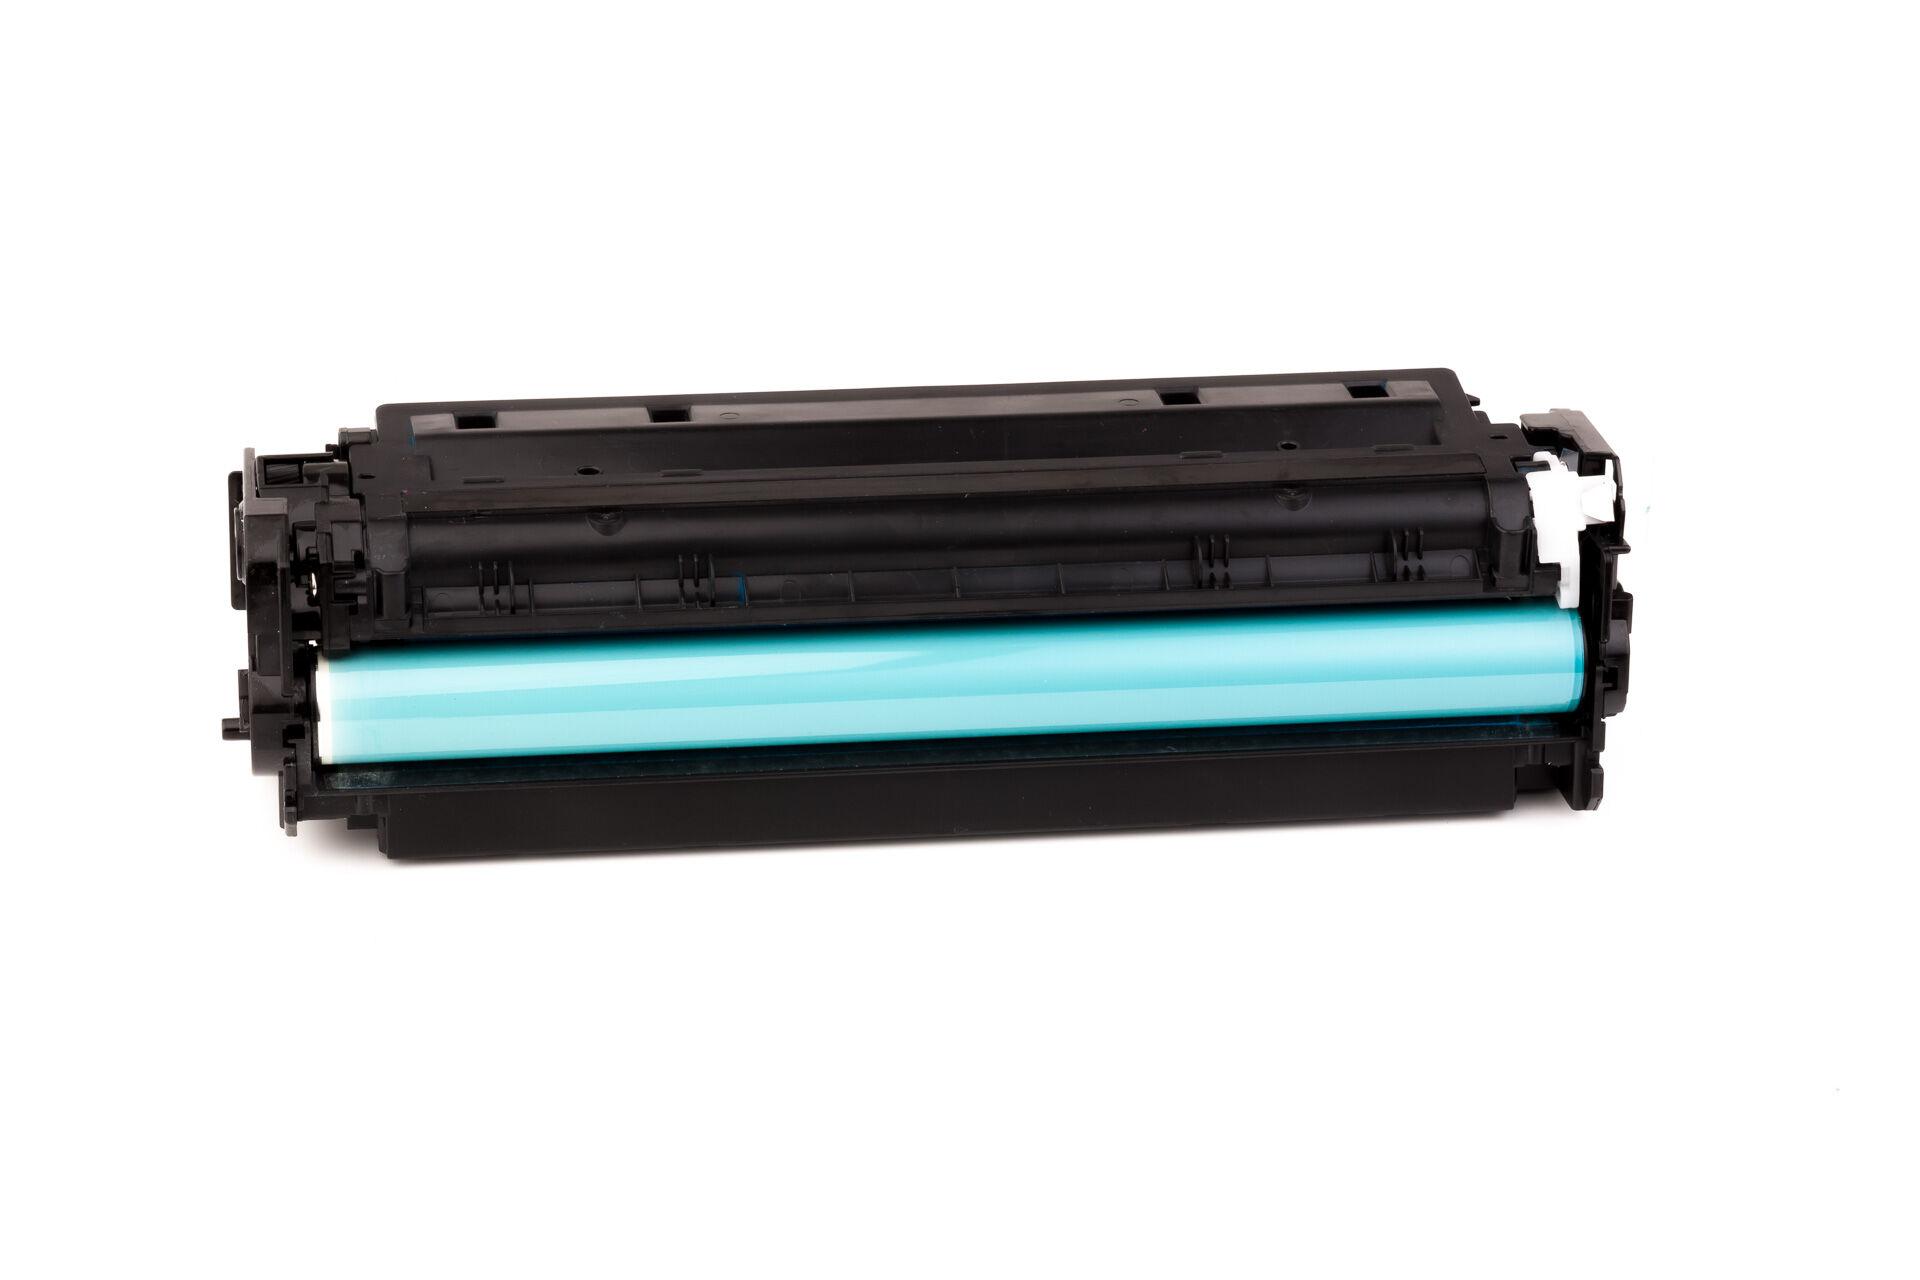 HP Cartouche de Toner pour HP CC531A / 304A cyan compatible (de marque ASC)